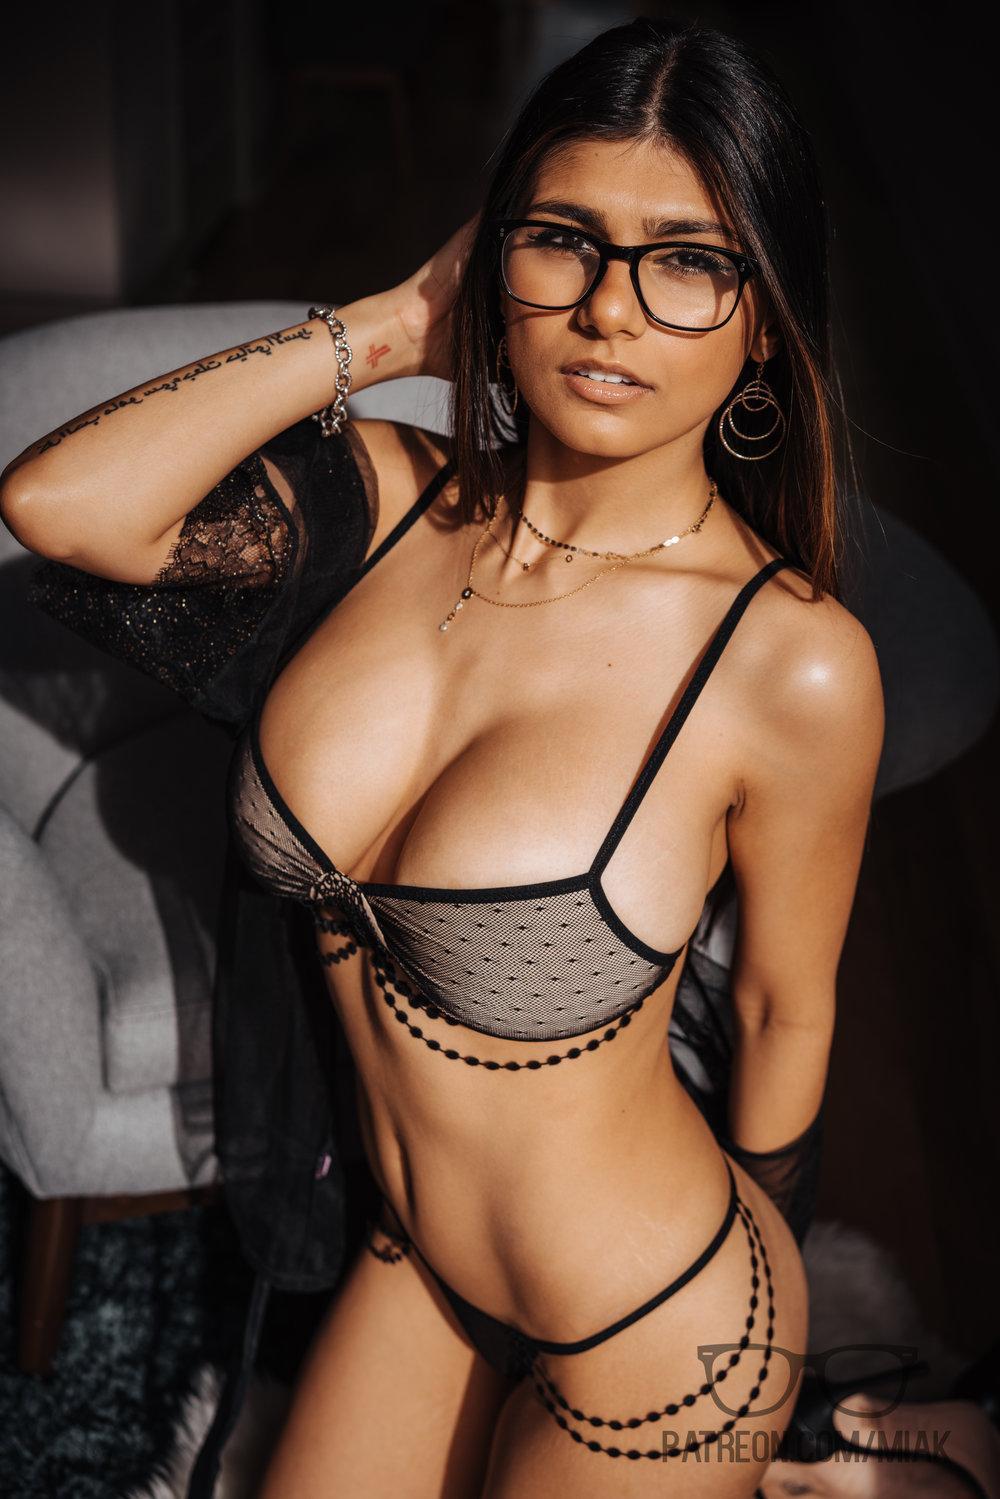 Mia Khalifa Lingerie Stiletto Heels Photoshoot Leaked 0009